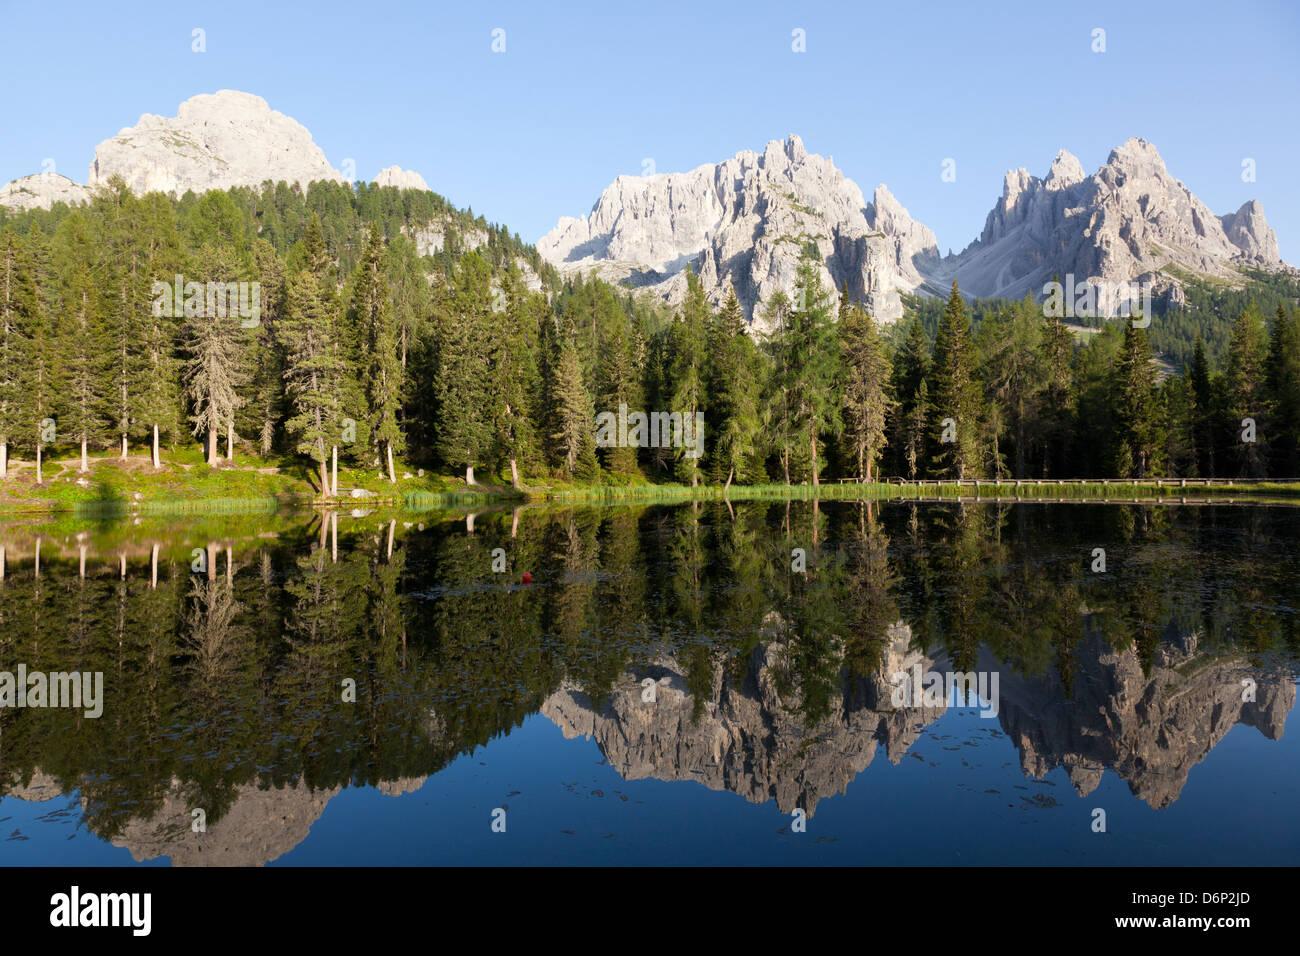 Reflections at sunset on Antorno Lake, Misurina, Tre Cime di Lavaredo, Belluno, Dolomites, Italy, Europe - Stock Image